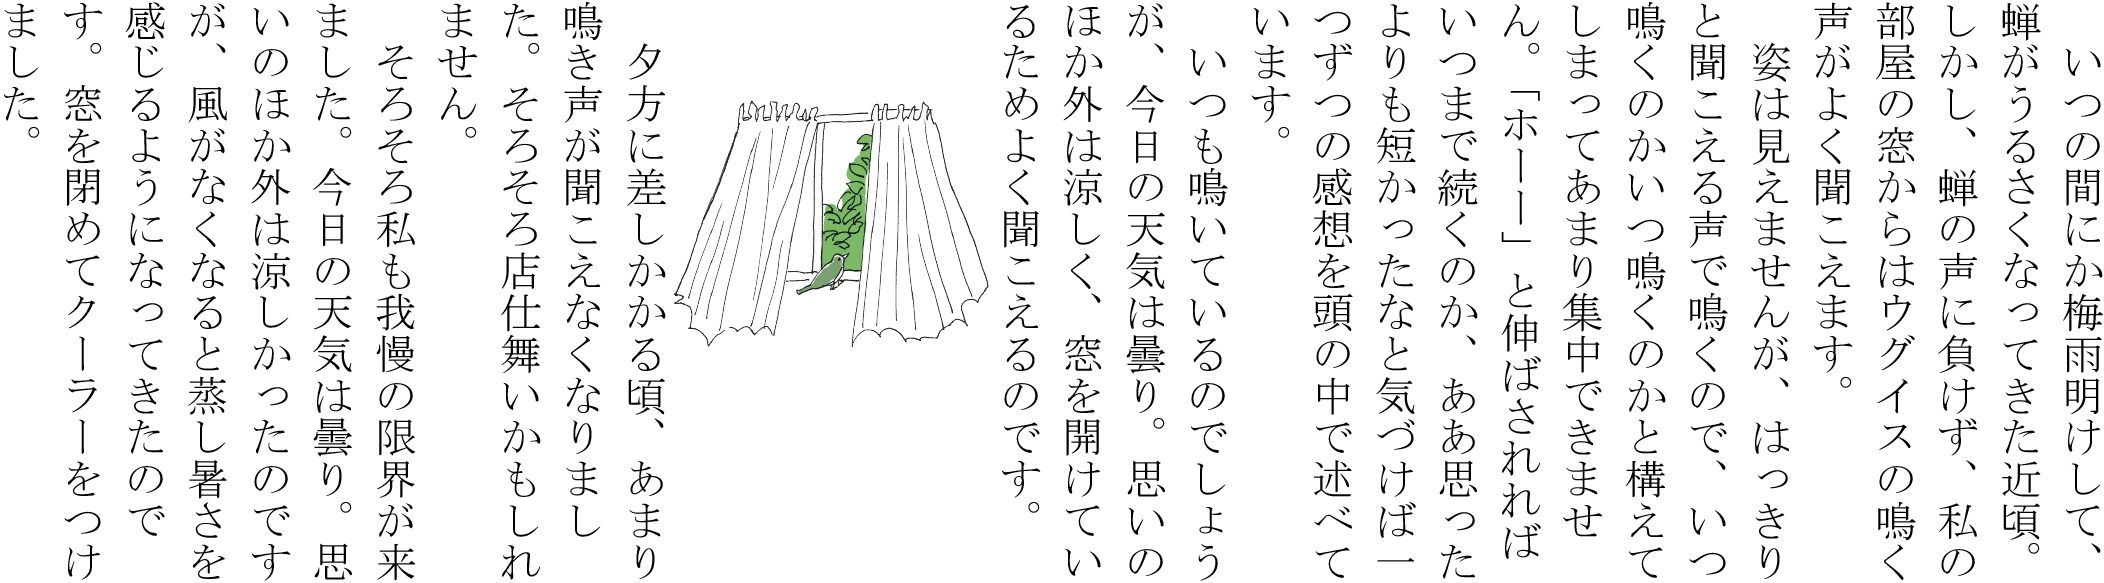 f:id:hikikoma:20160720160200p:plain